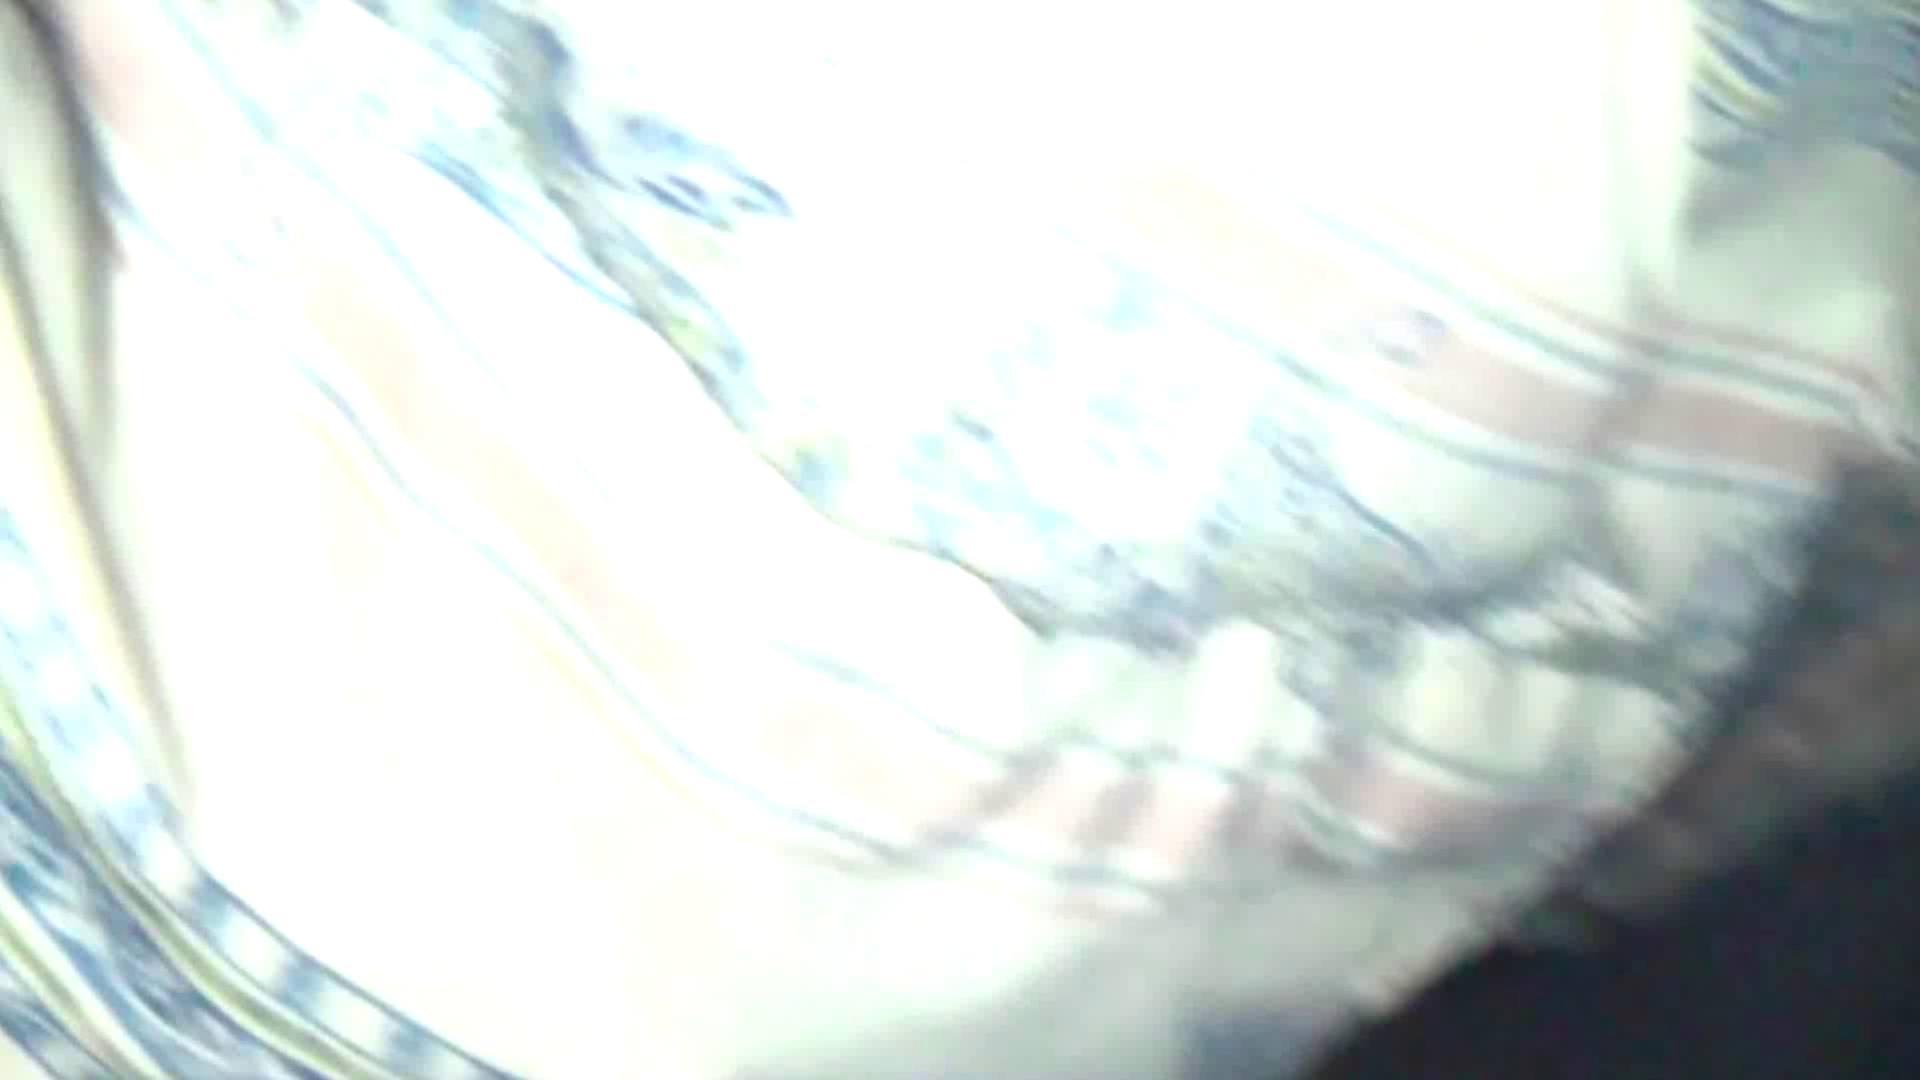 vol.34 【AIちゃん】 黒髪19歳 夏休みのプチ家出中 1回目 ギャル攻め AV無料 68画像 12